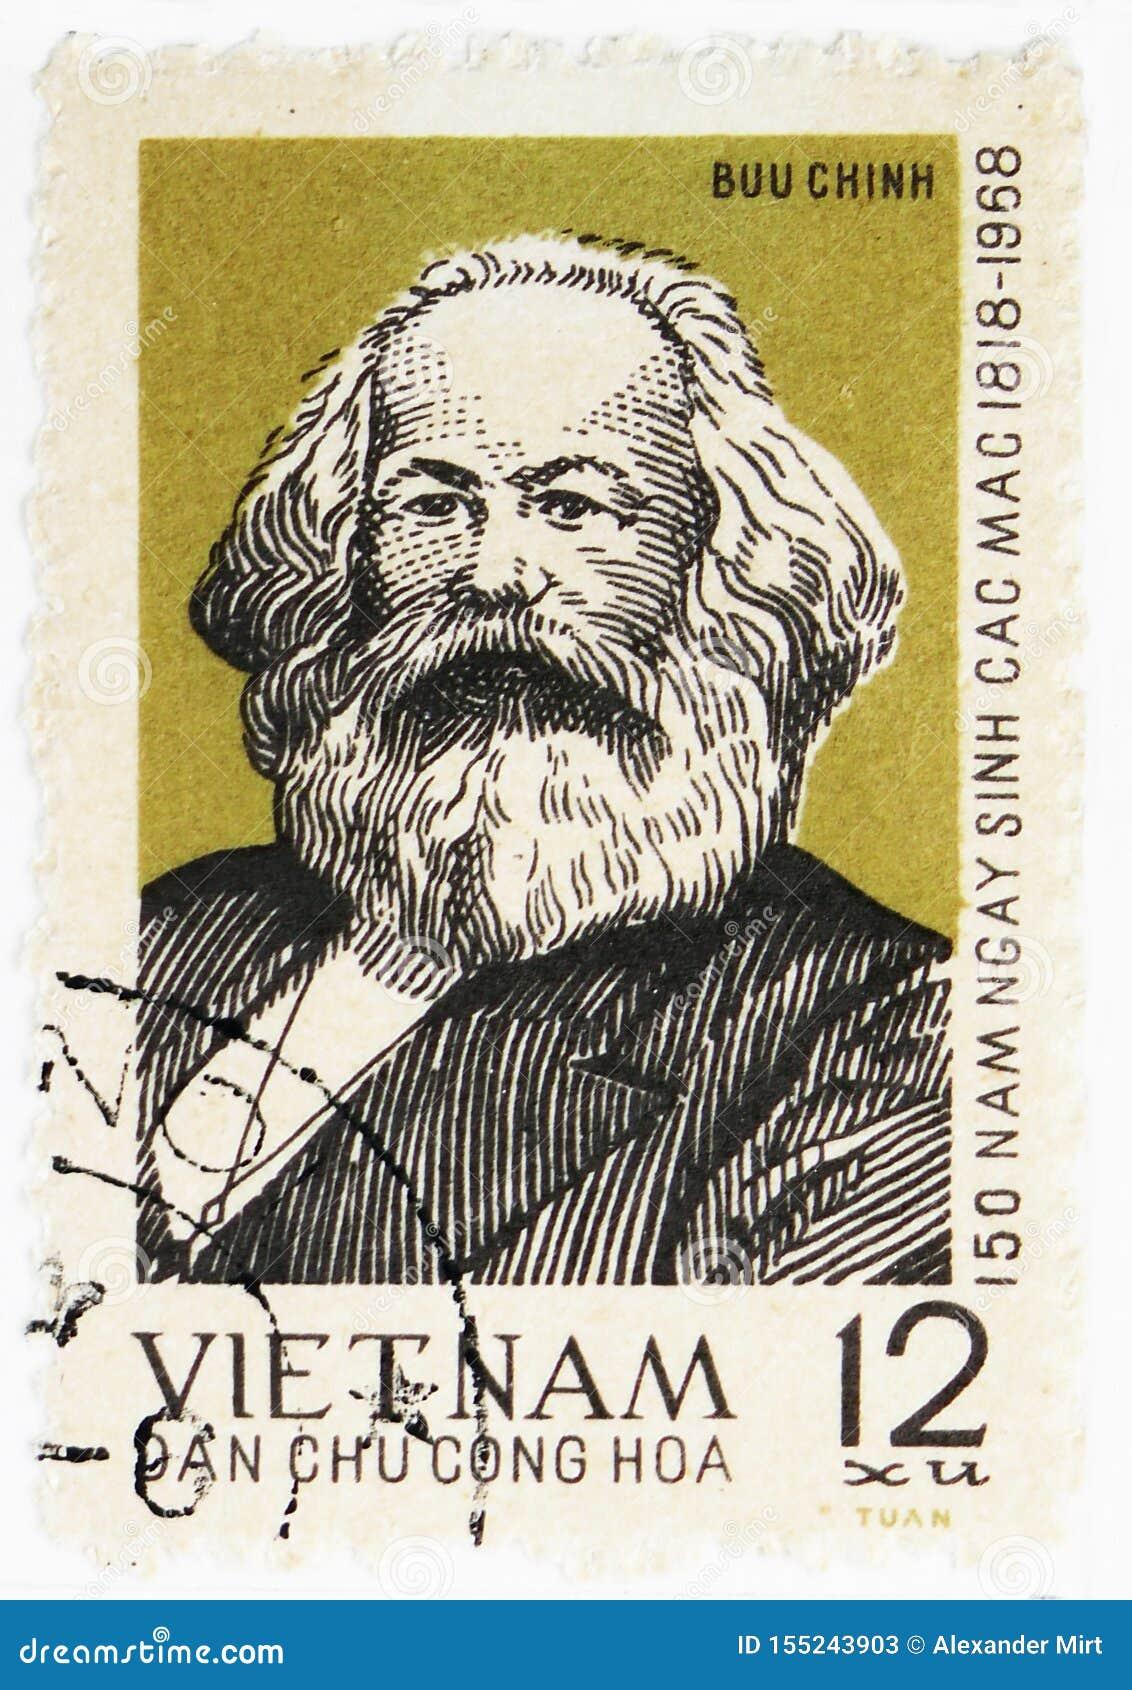 Stående av Karl Marx, 150. födelseårsdag av Karl Marx (1818 - 1883) serie, circa 1968